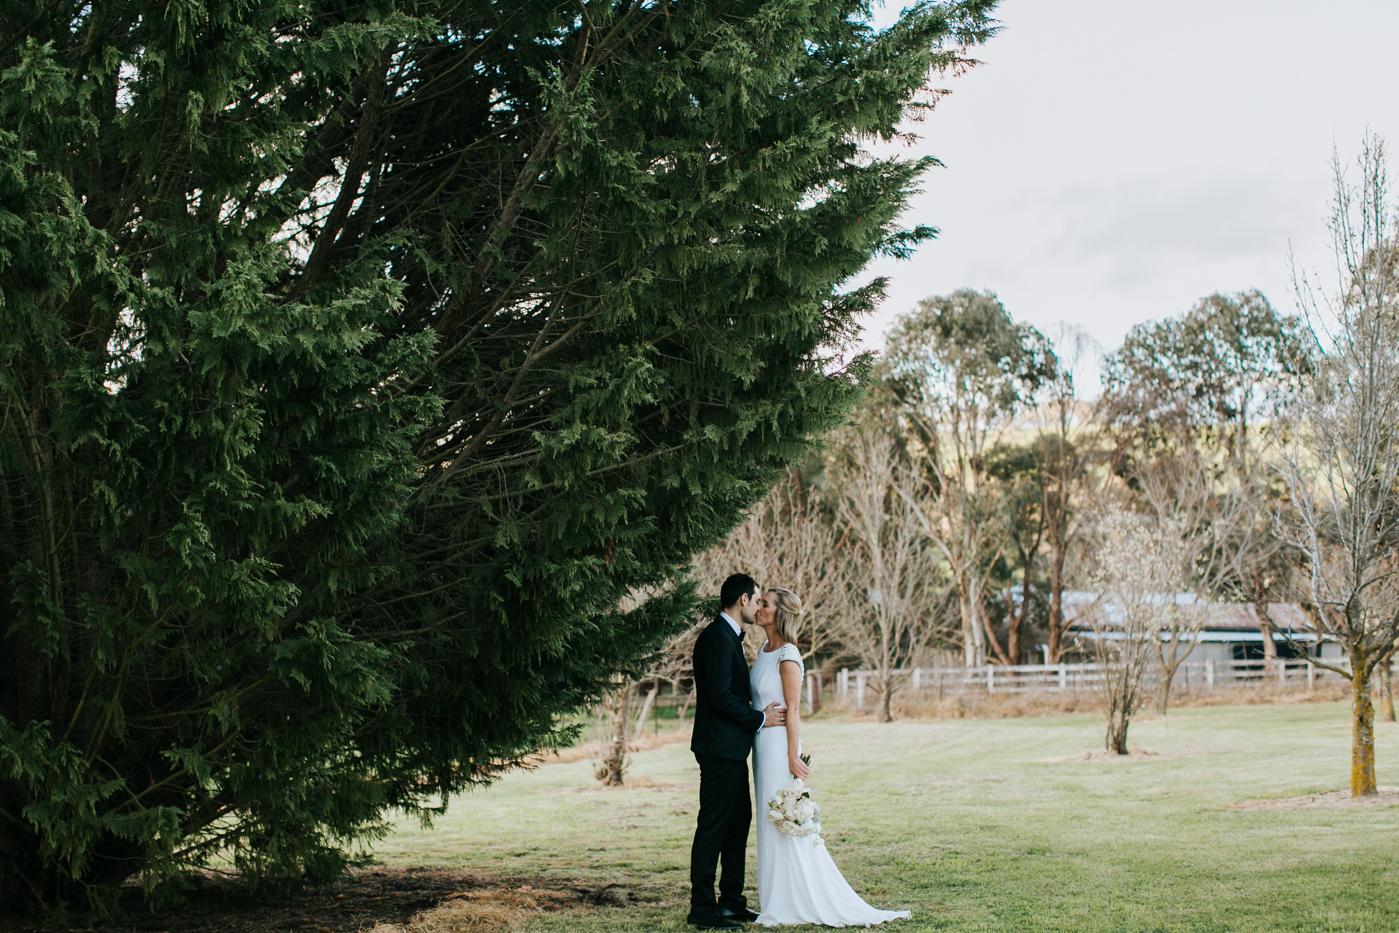 Bridget & James - Orange Country Wedding - Samantha Heather Photography-138.jpg